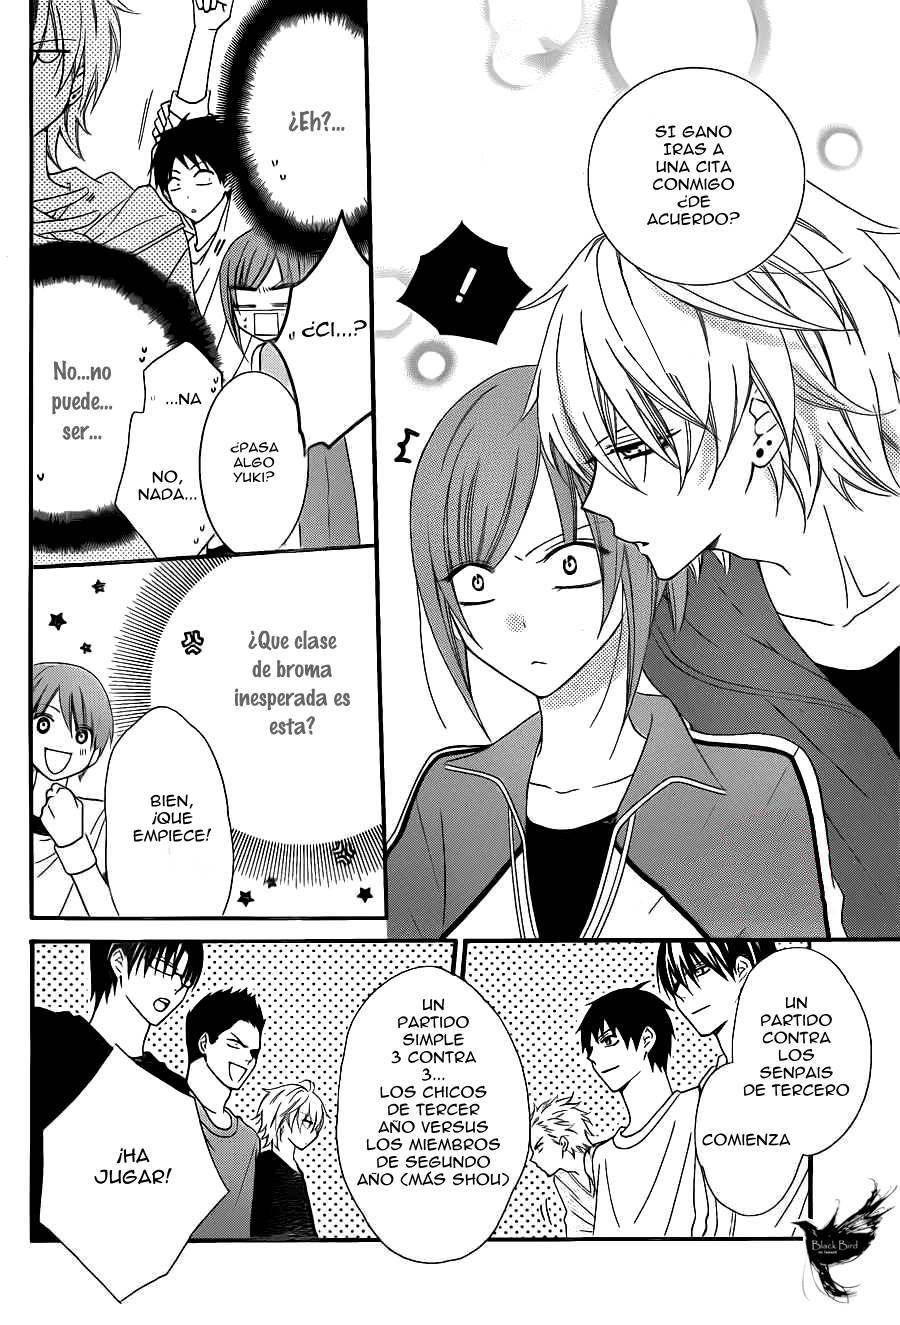 Namaikizakari Vol 1 Ch 2 Página 2 Cargar Imágenes 10 Namaikizakari Manga To Read Shoujo Manga